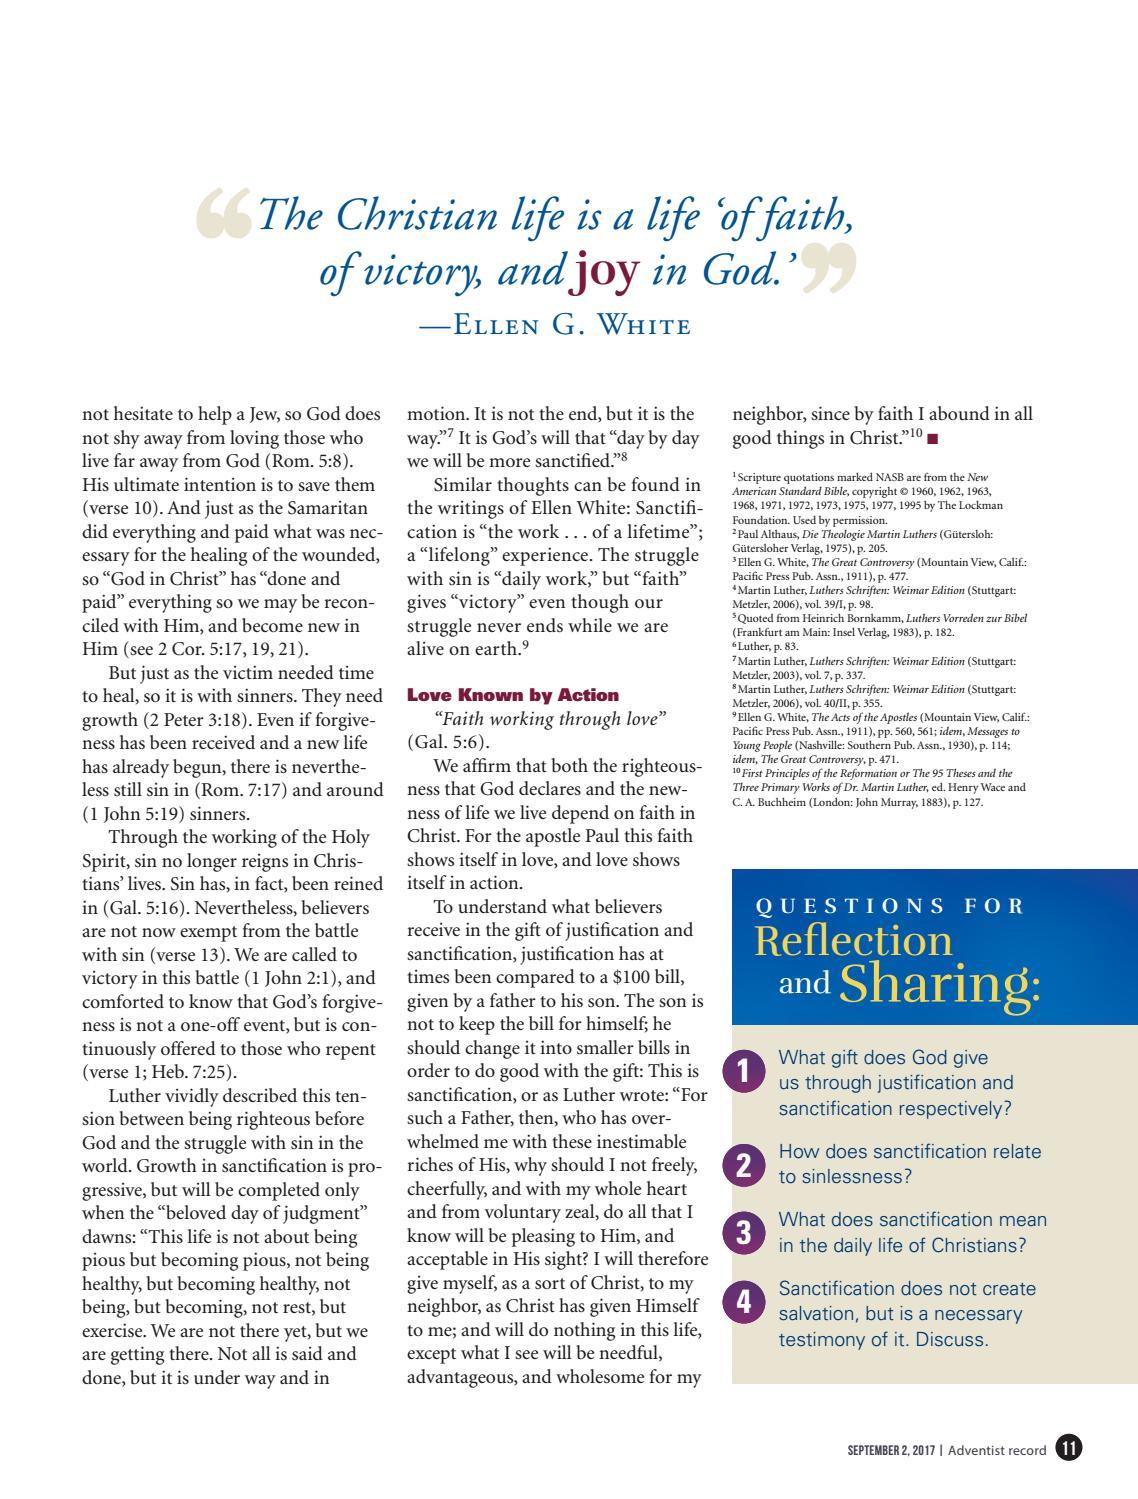 Adventist Record (Week of Prayer) - September 2, 2017